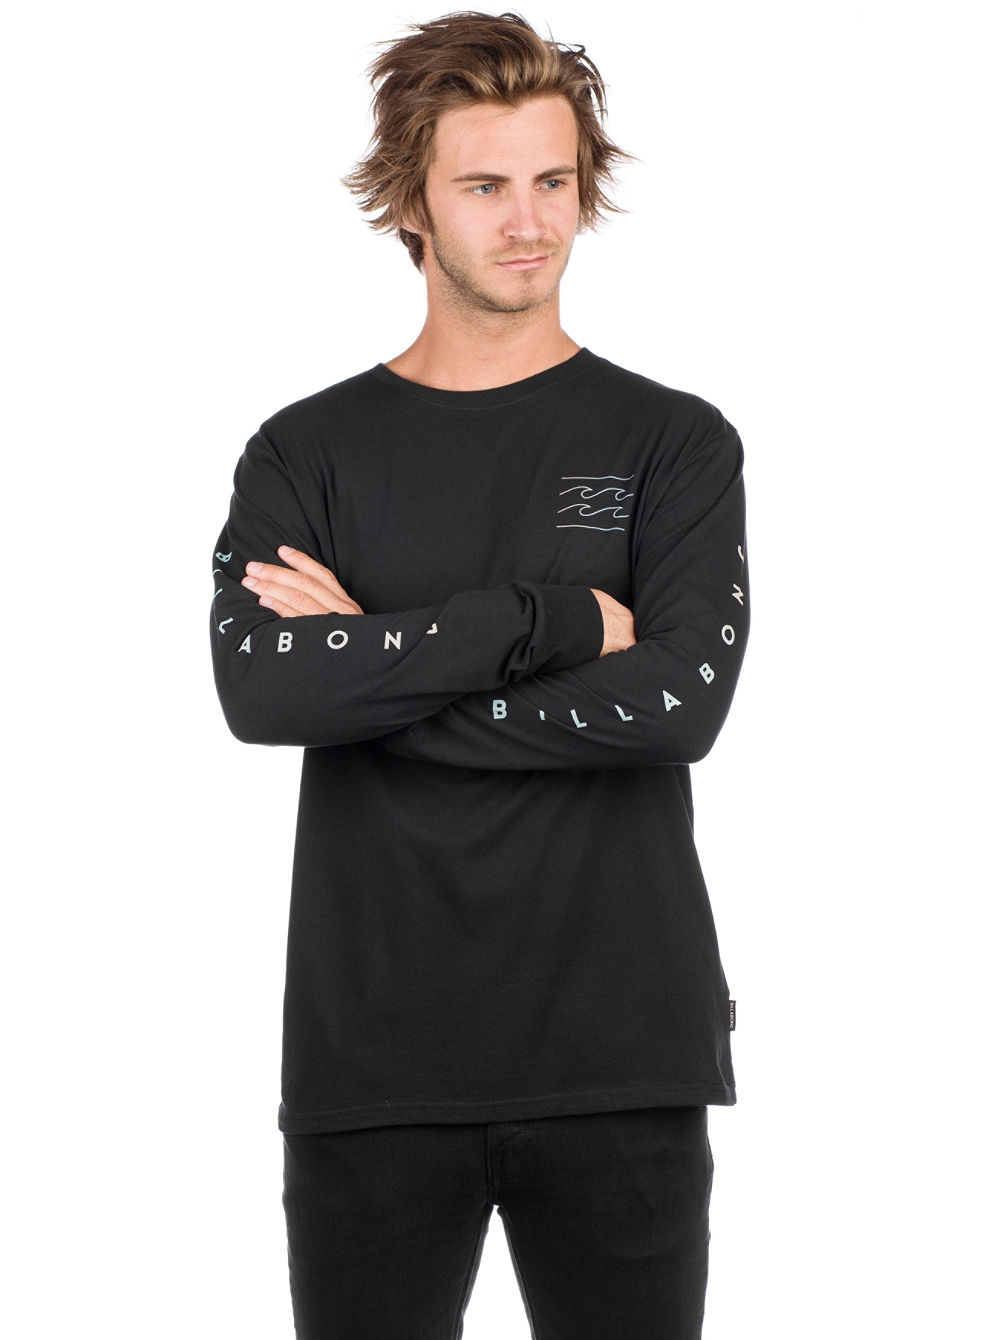 70a90c1f Buy Billabong Unity Long Sleeve T-Shirt online at Blue Tomato